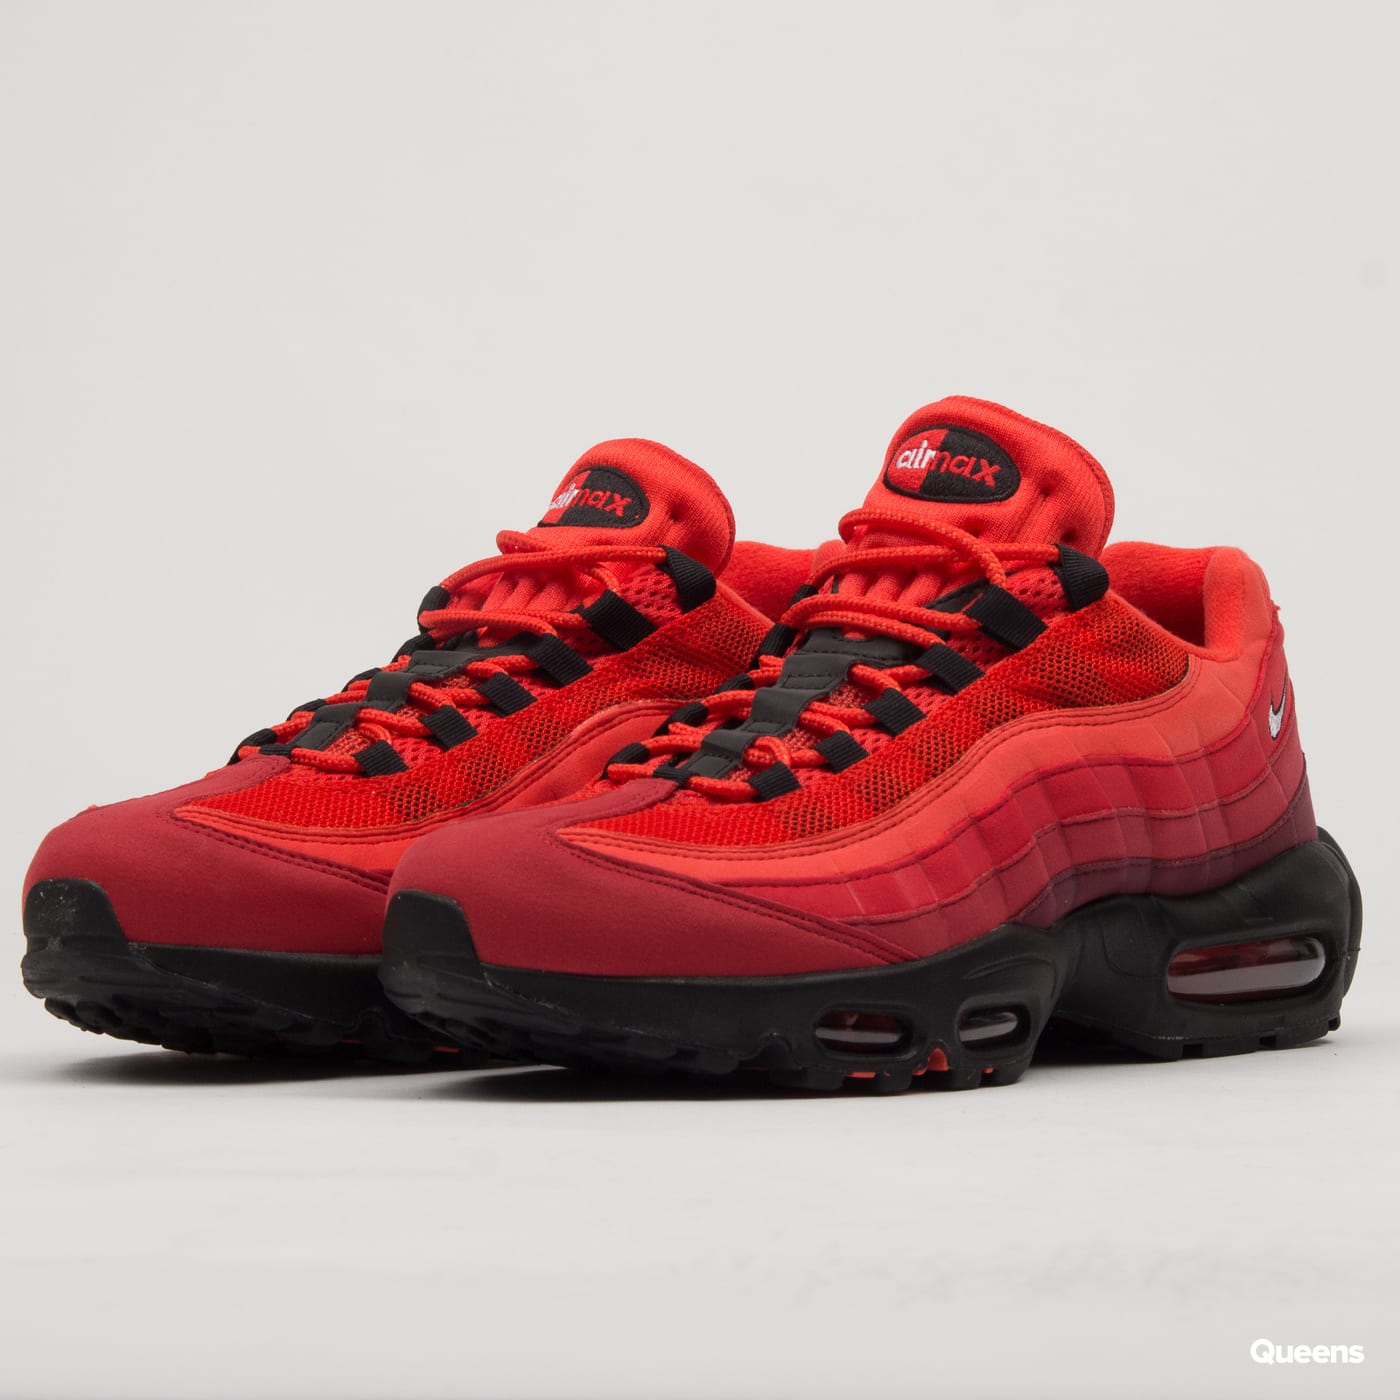 94cf3eaf3e5 Boty Nike Air Max 95 OG (AT2865-600) – Queens 💚